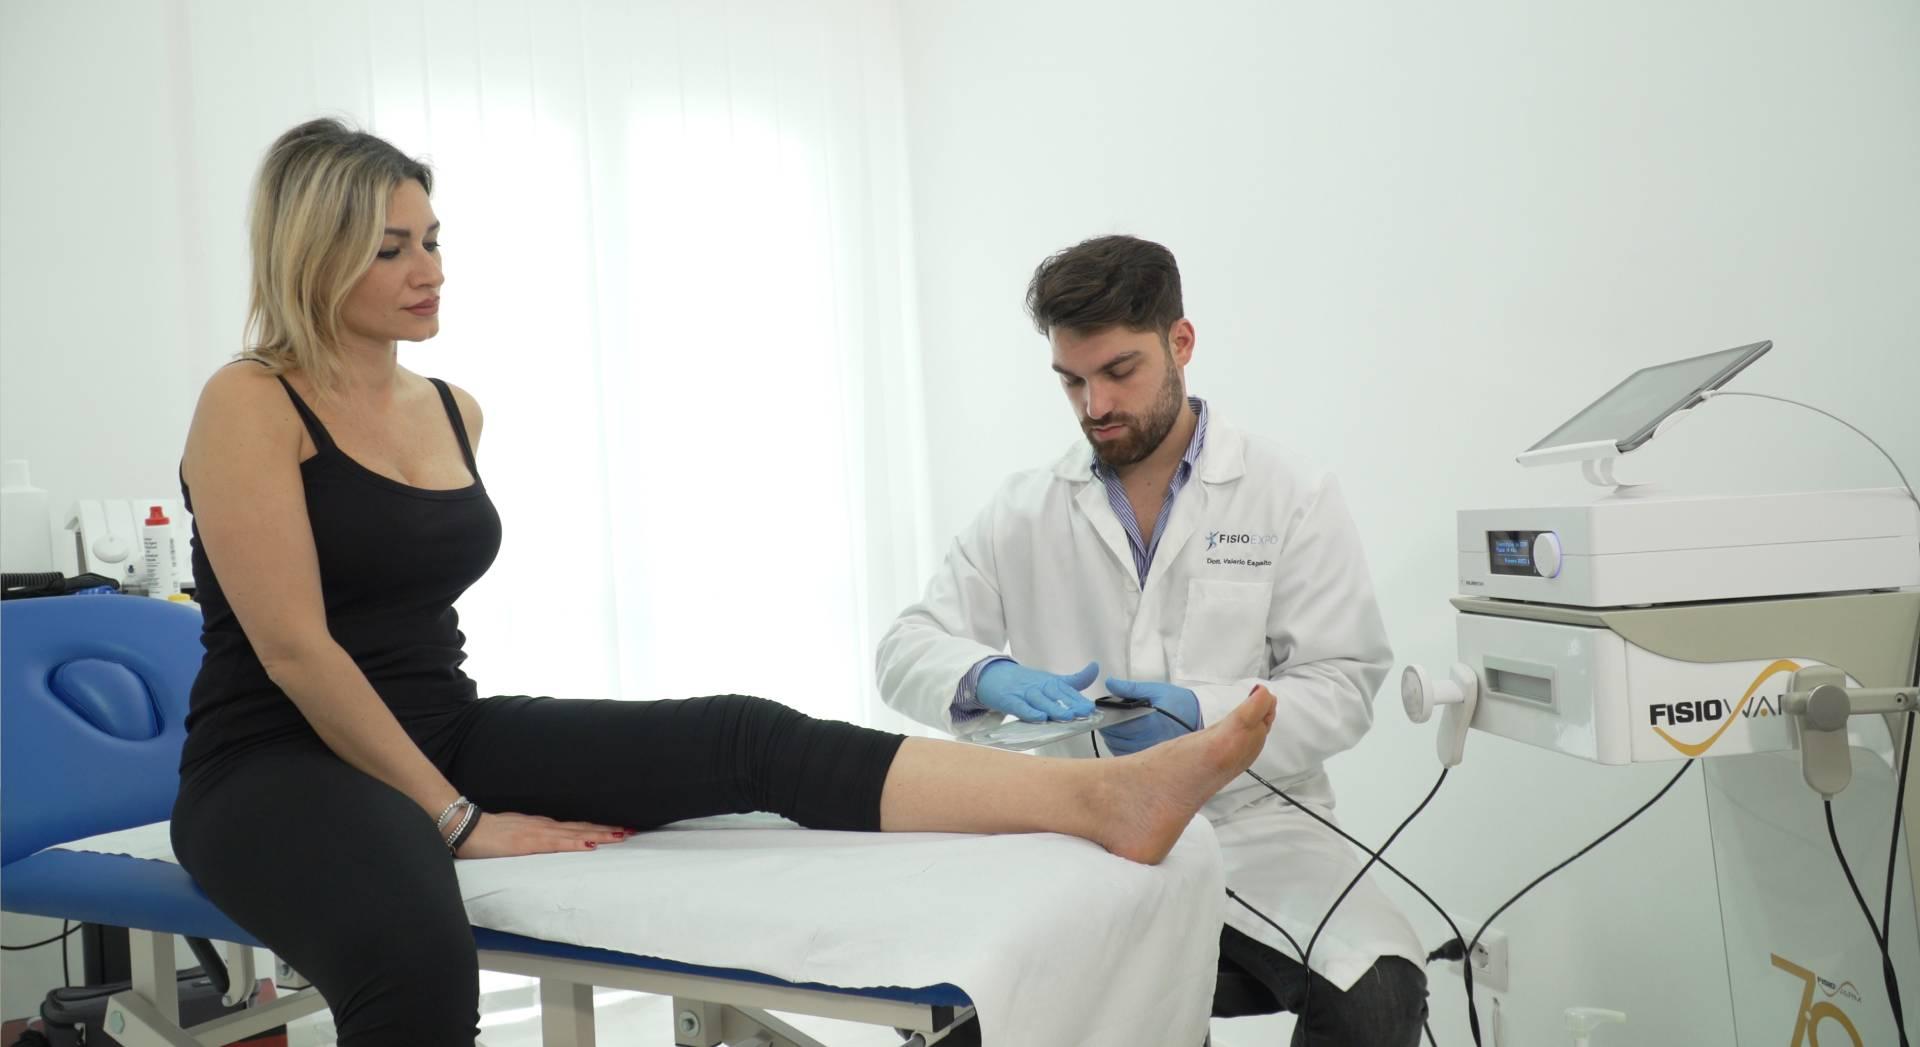 Una seduta di tecarterapia al piede